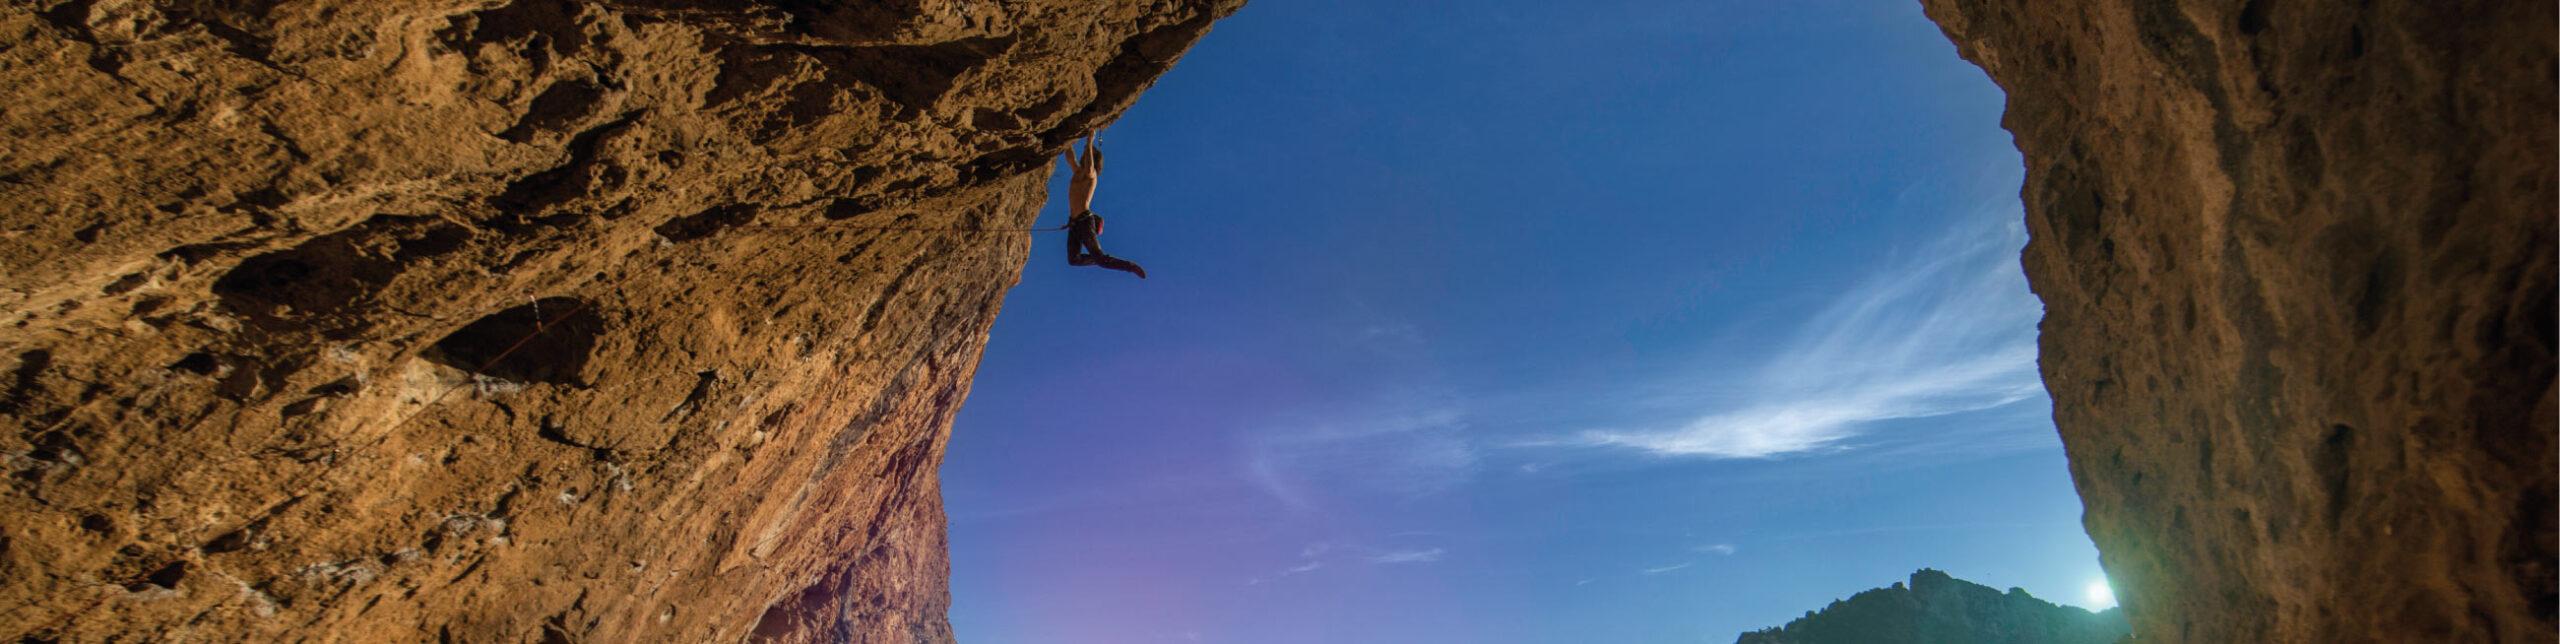 Climbing in Sant Llorenç de Montgai and Camarasa